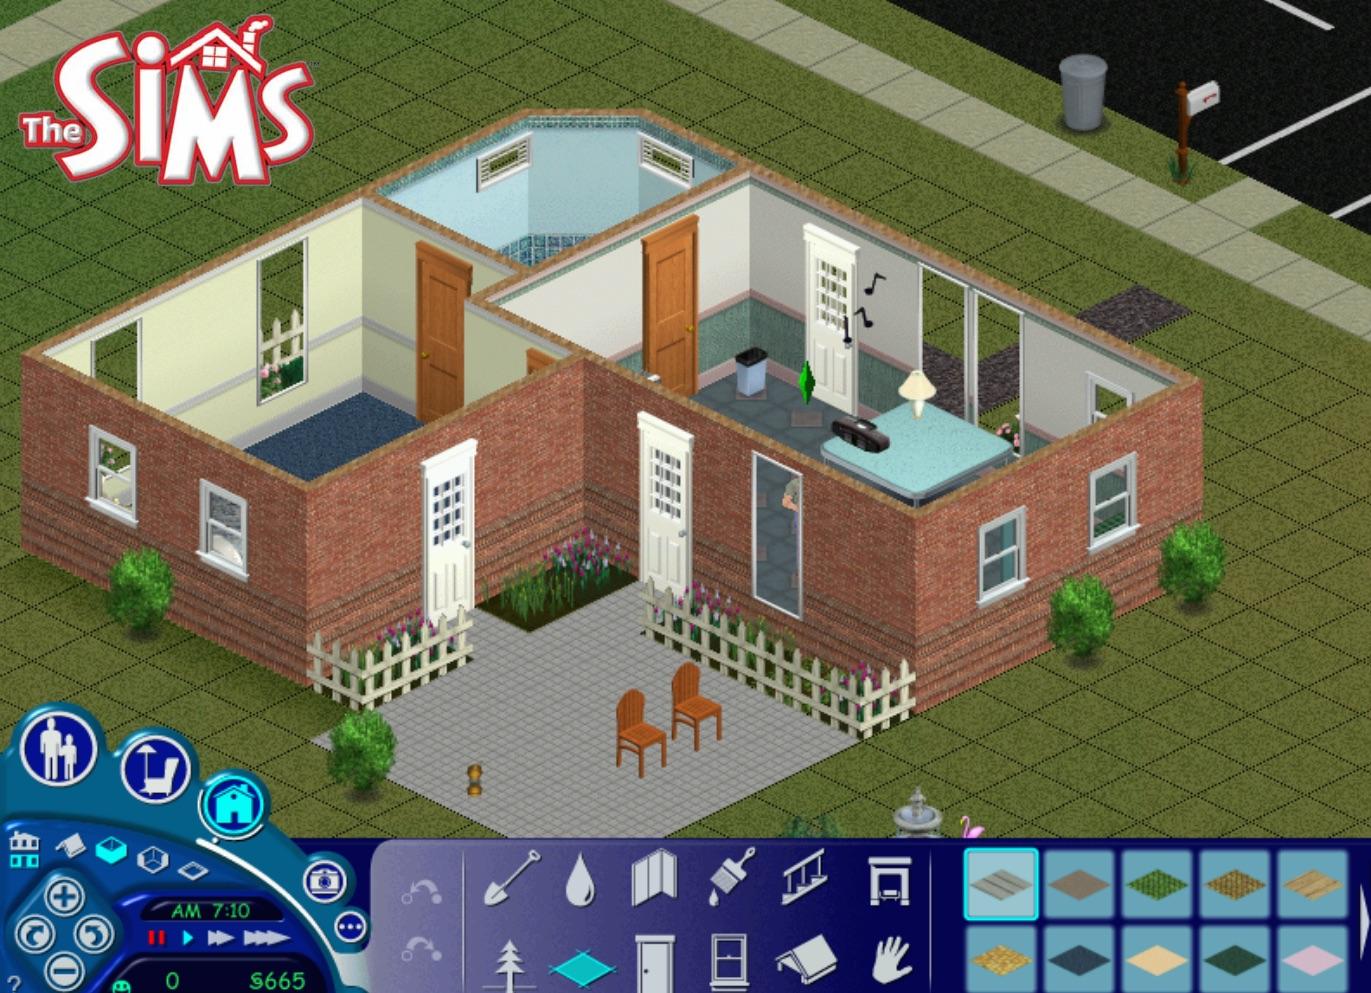 mod the sims sims 1 4 newbie house 7 sim lane. Black Bedroom Furniture Sets. Home Design Ideas